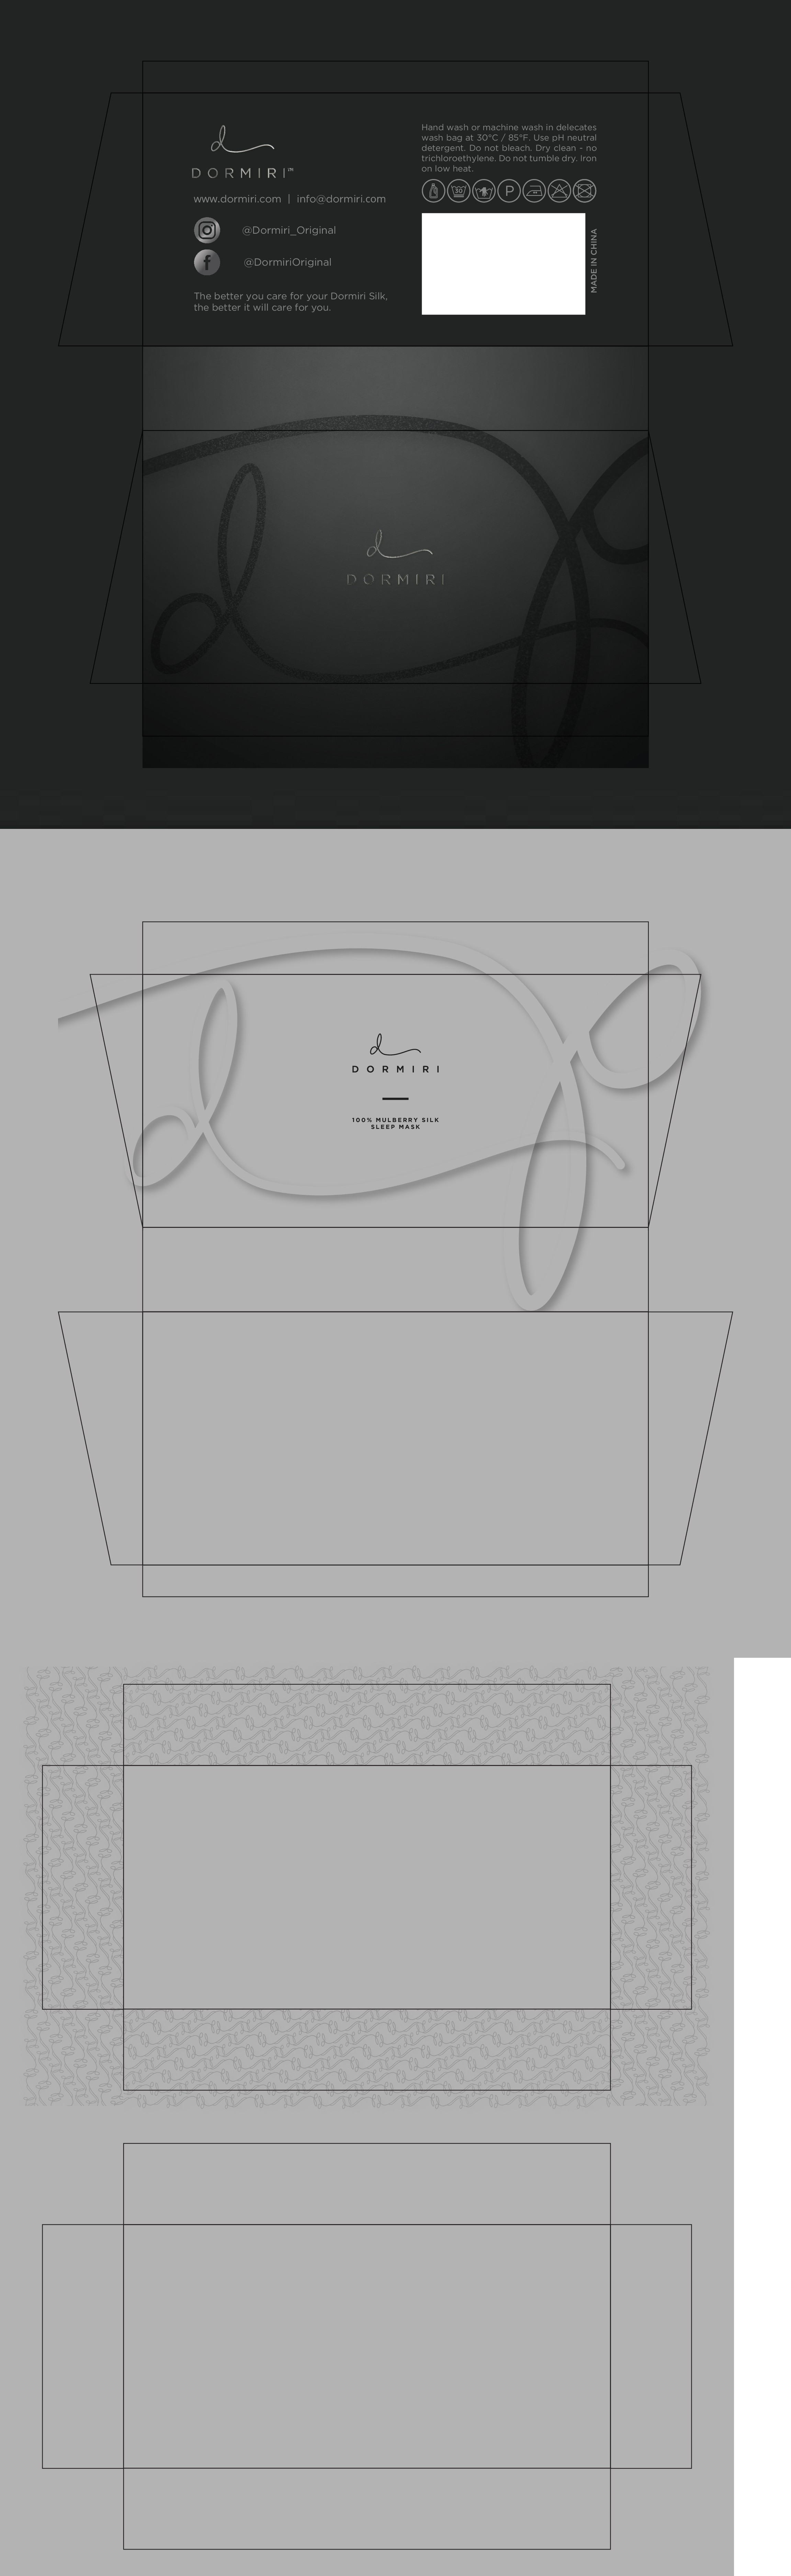 Unique sleek sophisticated packaging for Silk Sleep Mask